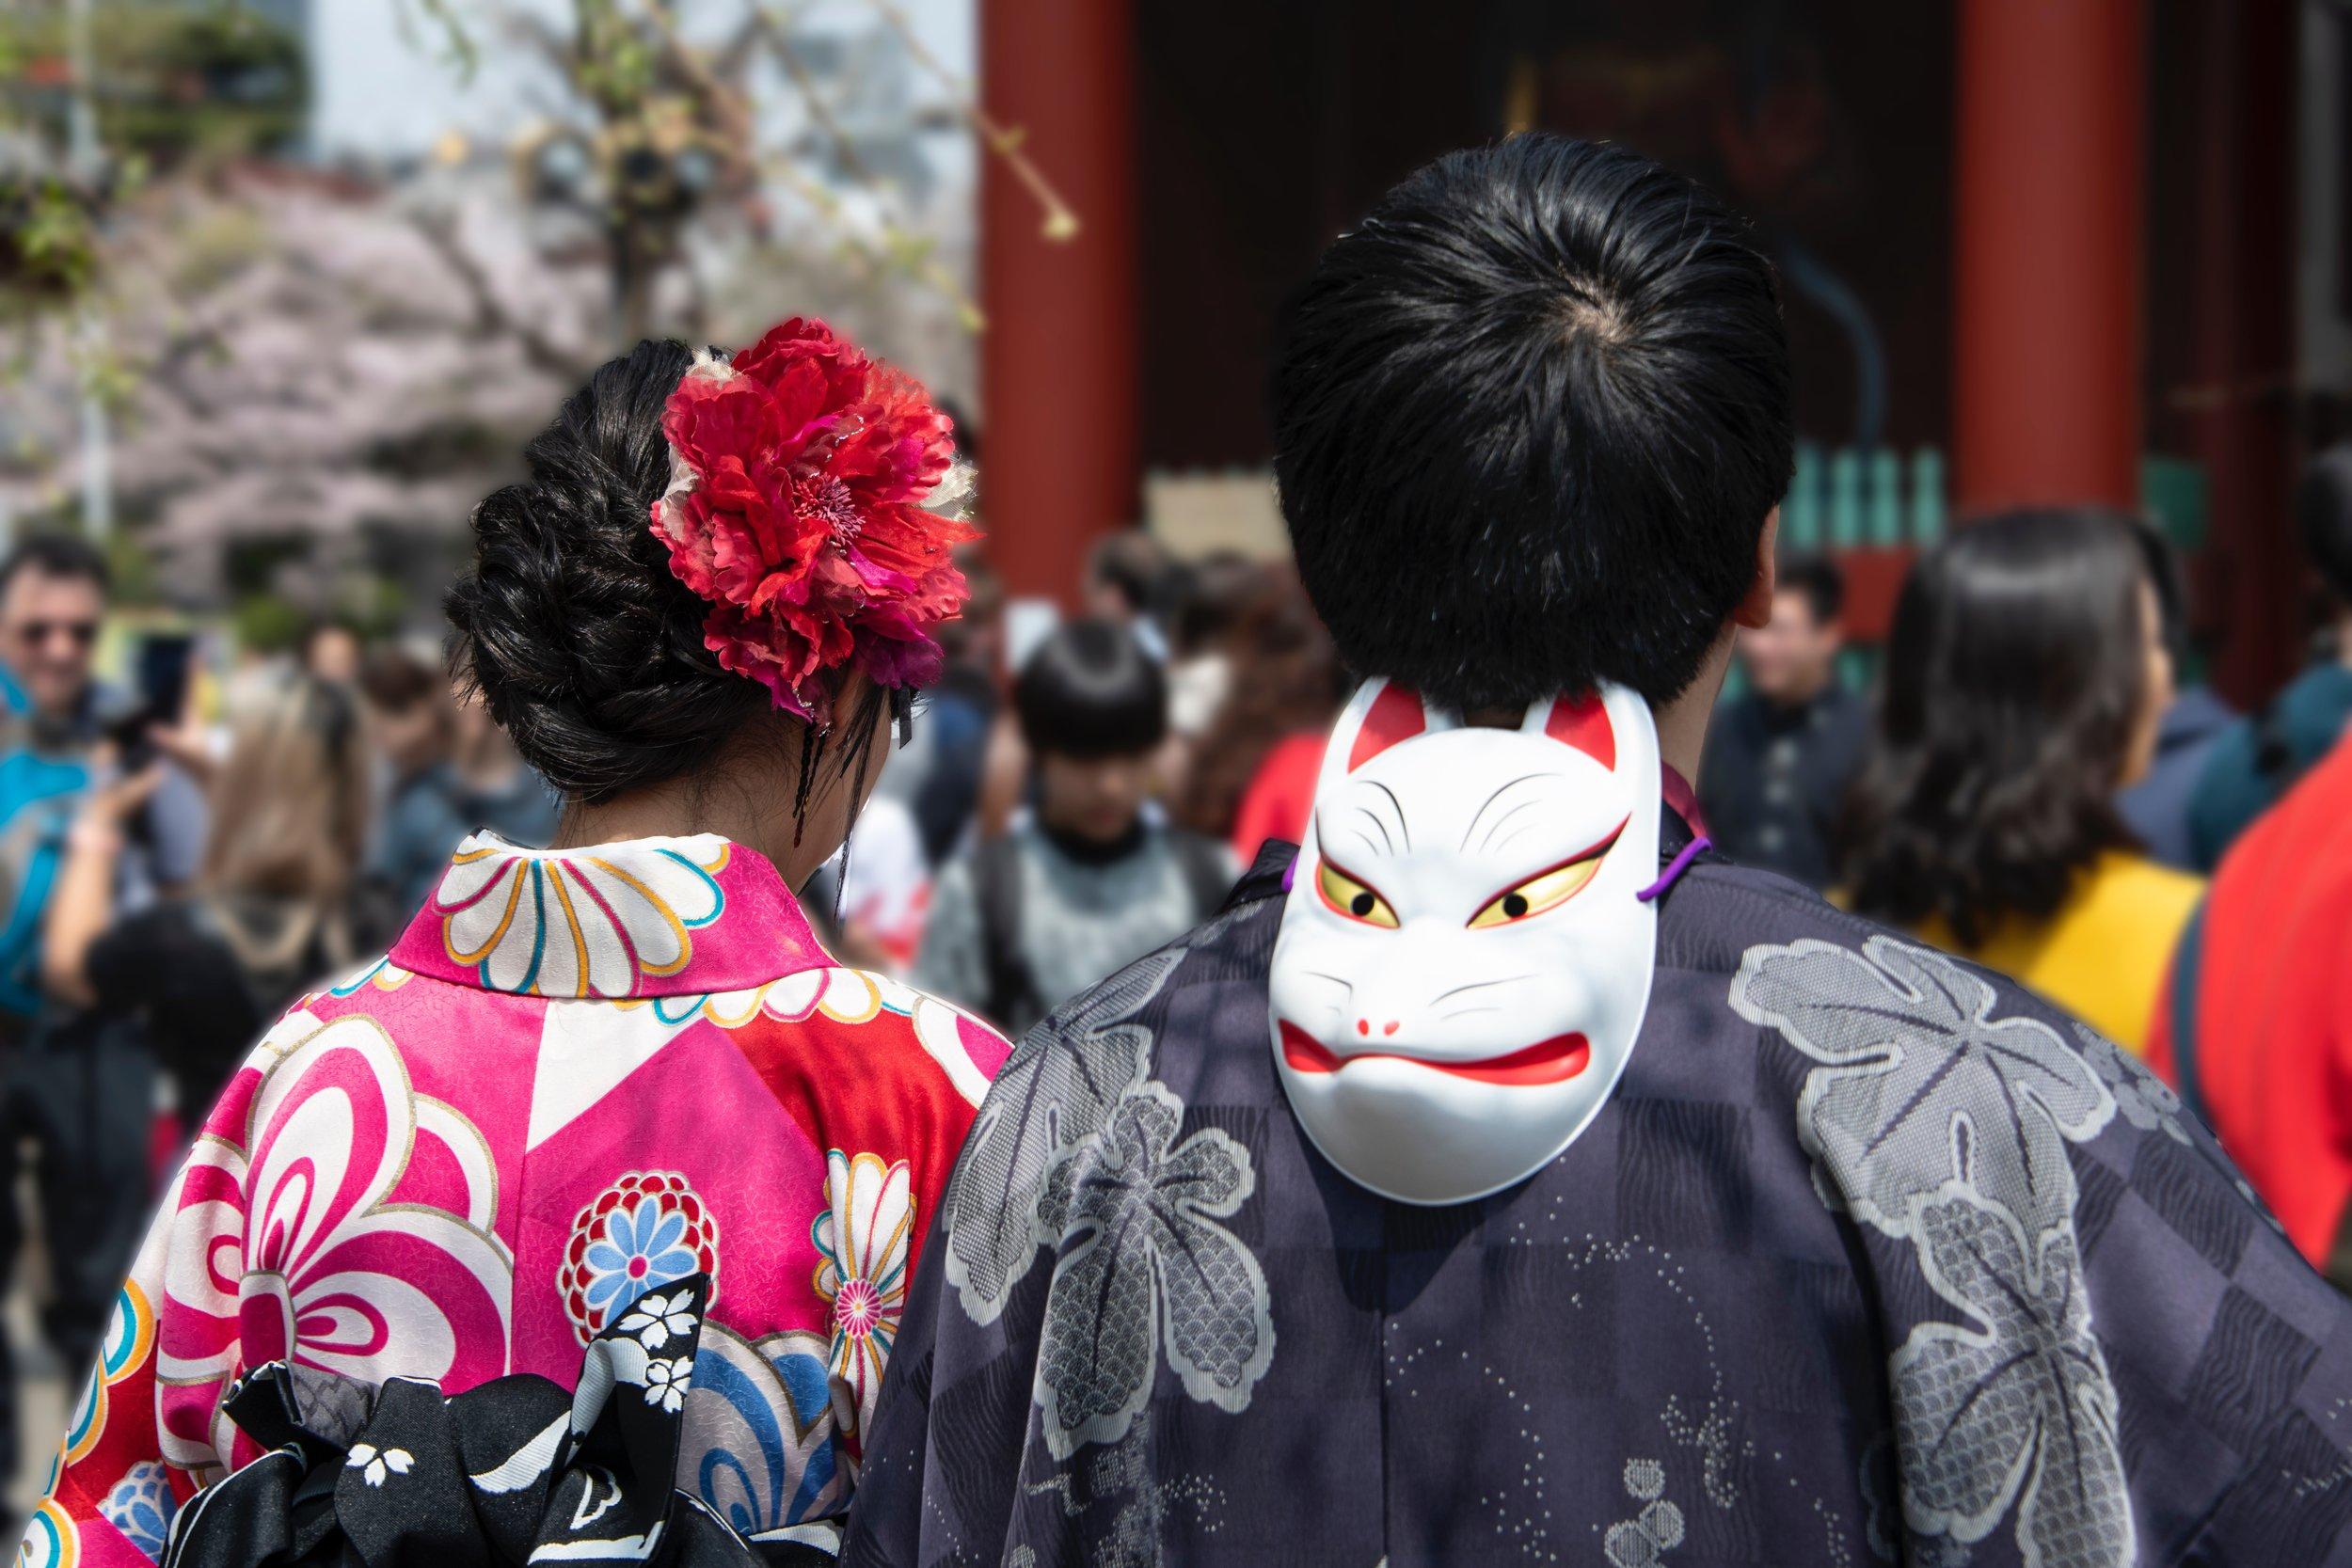 festival-japan-man-2156400.jpg